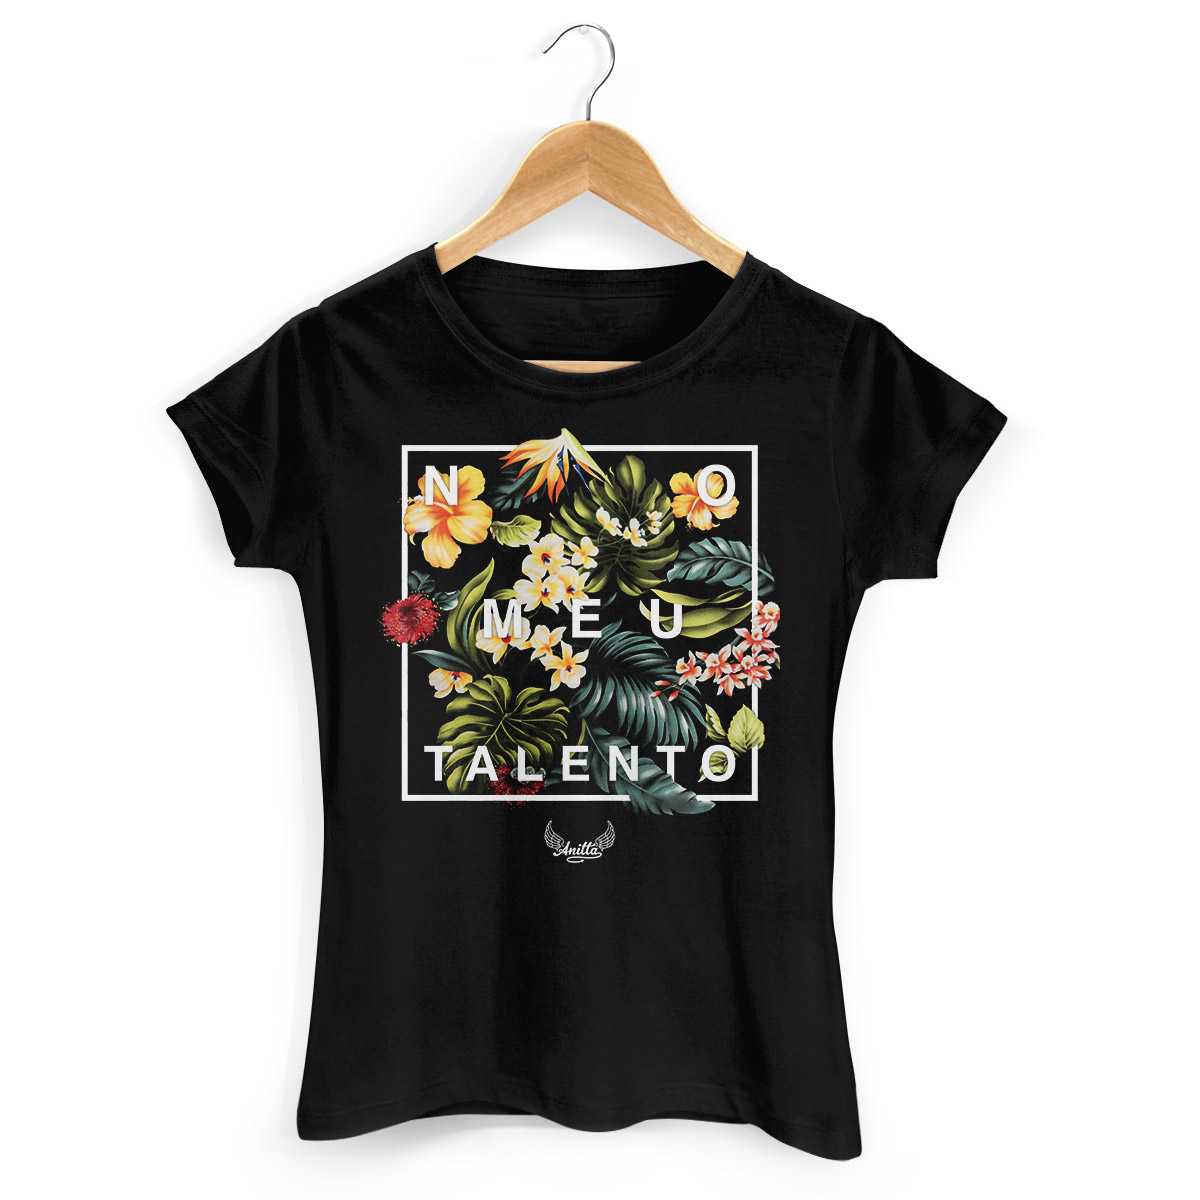 Camiseta Feminina Anitta Meu Talento Flowers